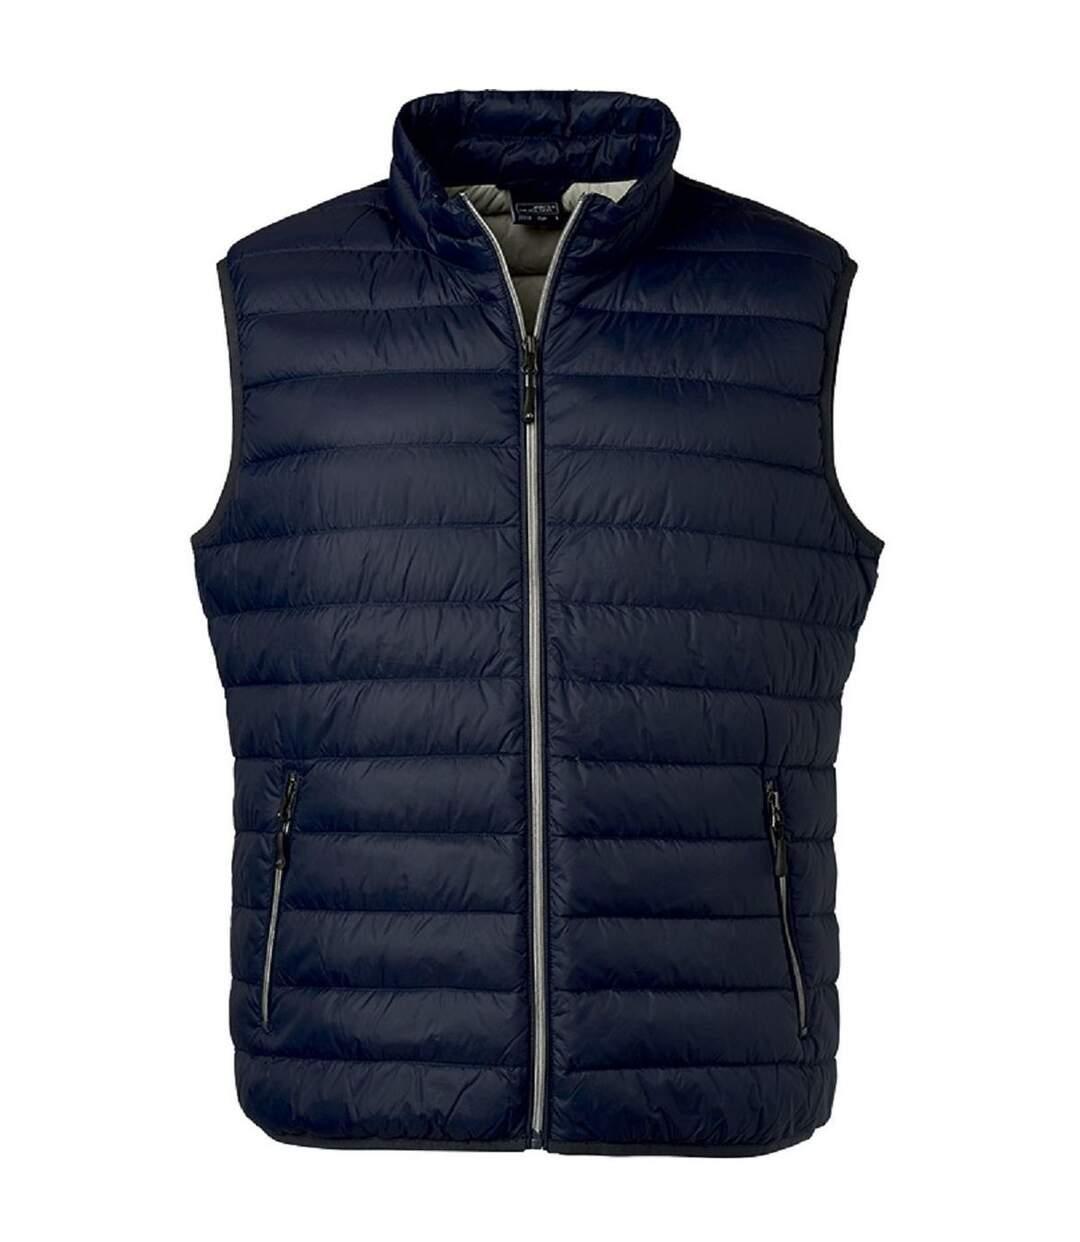 Bodywarmer duvet - JN1138 - bleu indigo - Homme